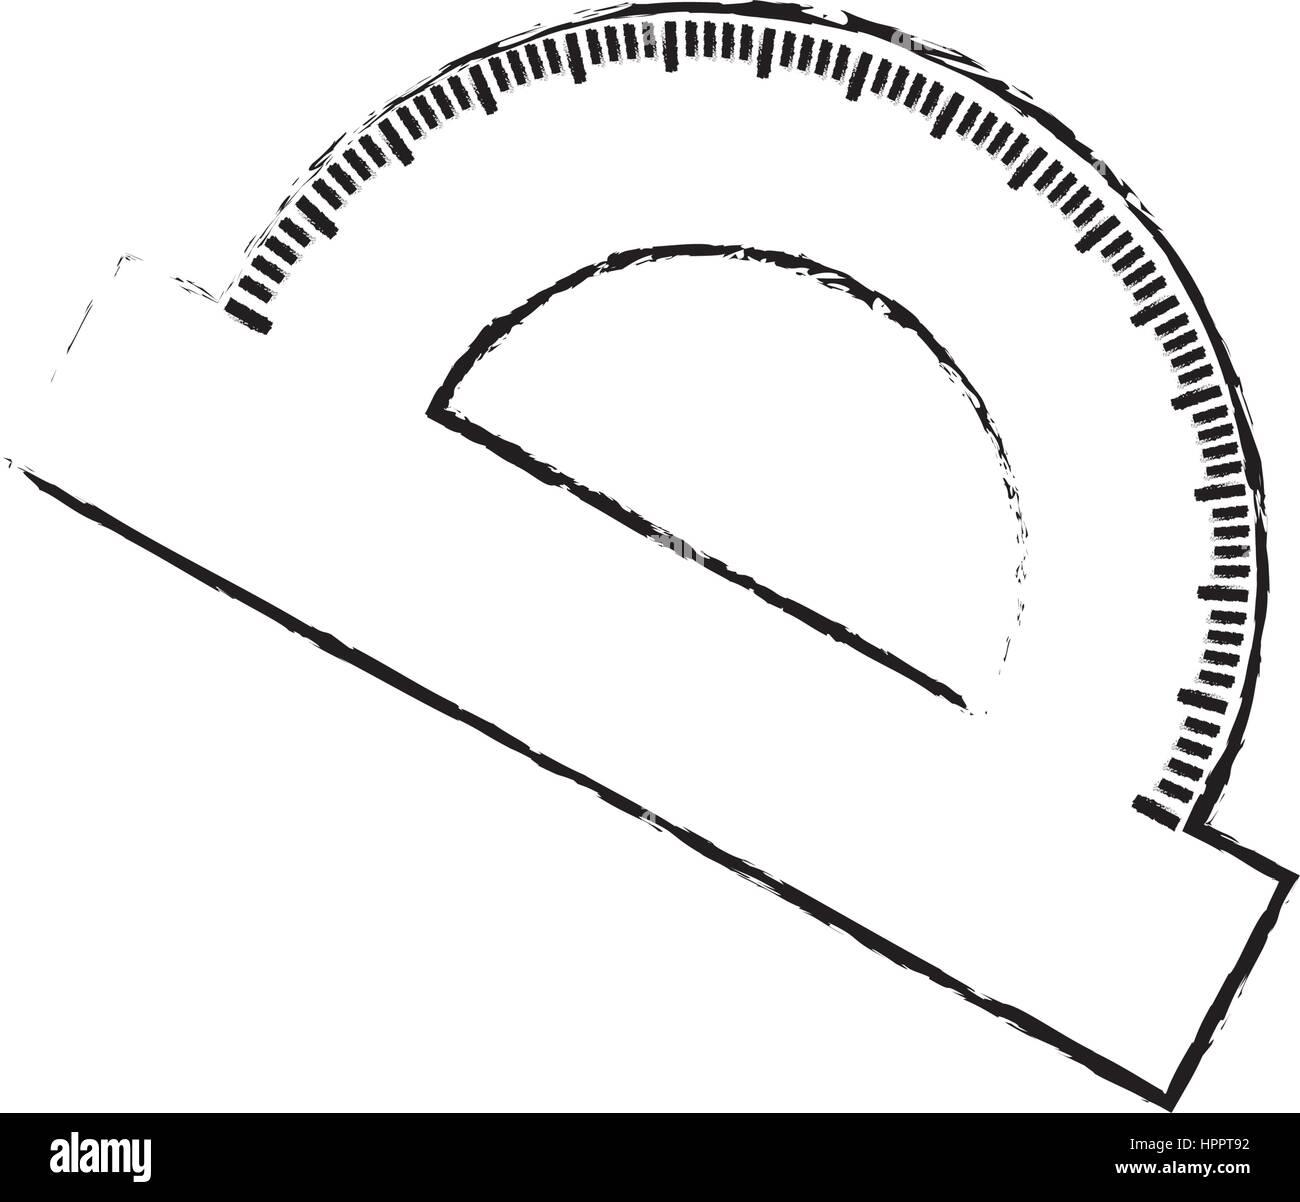 Measuring angles worksheet 4th grade free